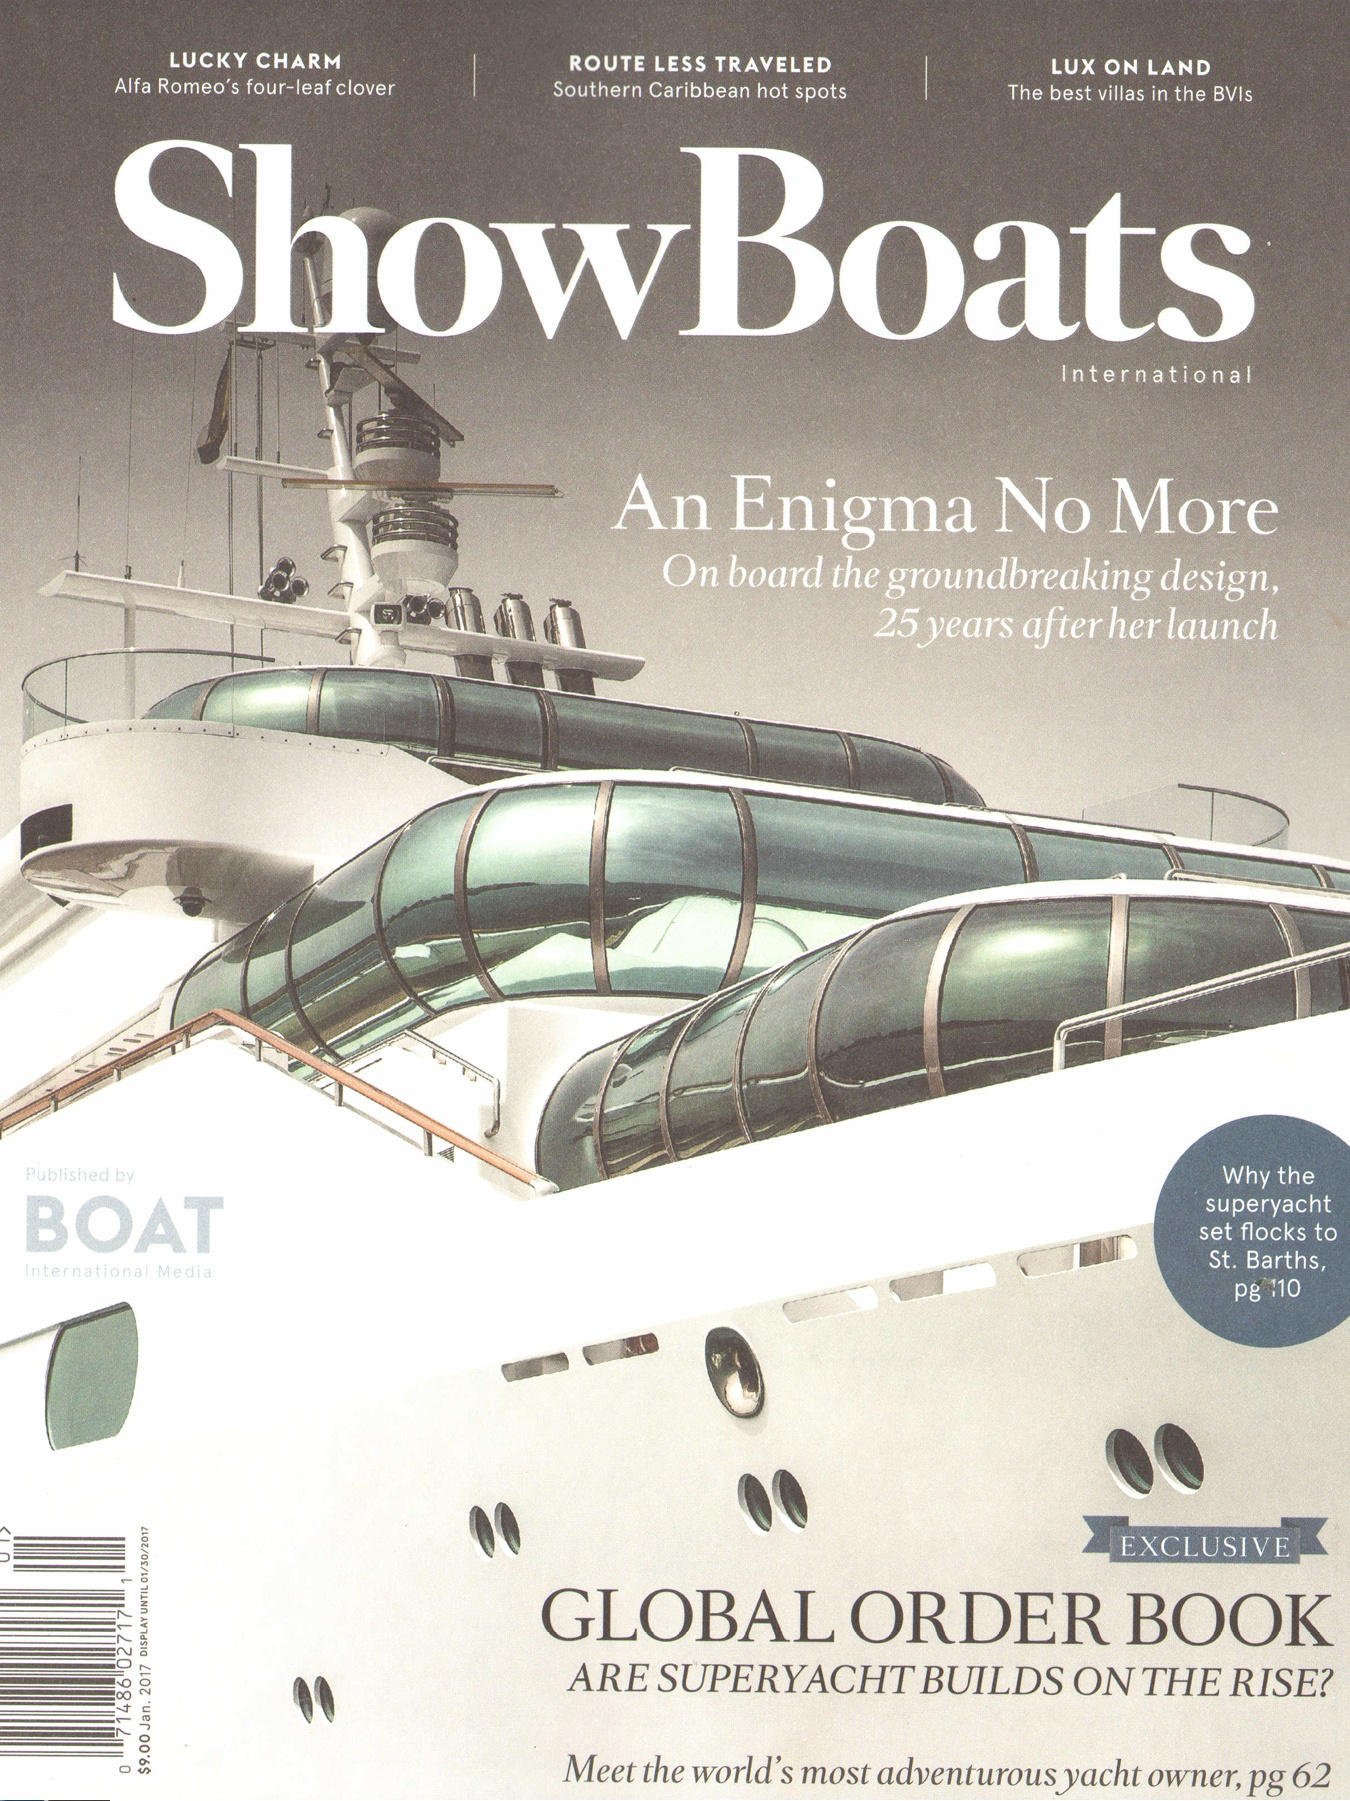 Showboats International Jan 2017 Front Cover_2.jpg